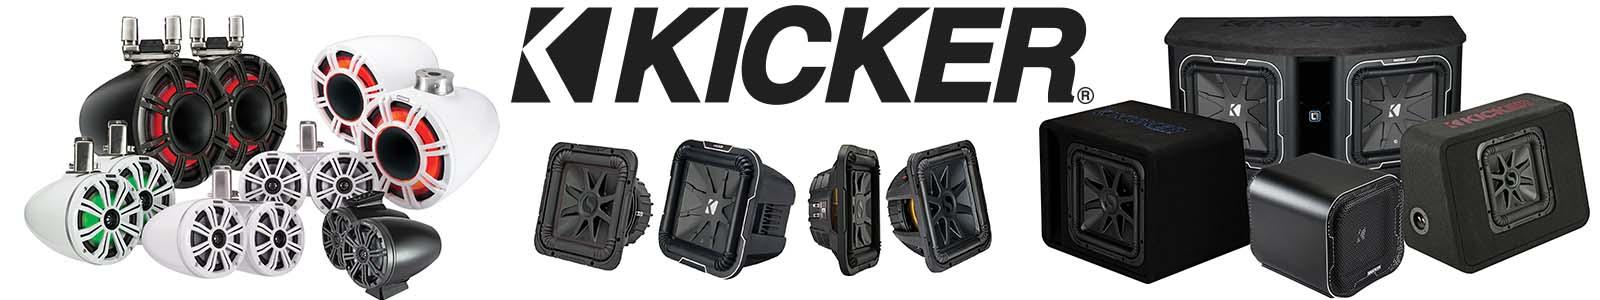 Kicker Performance Audio Authorized Dealer